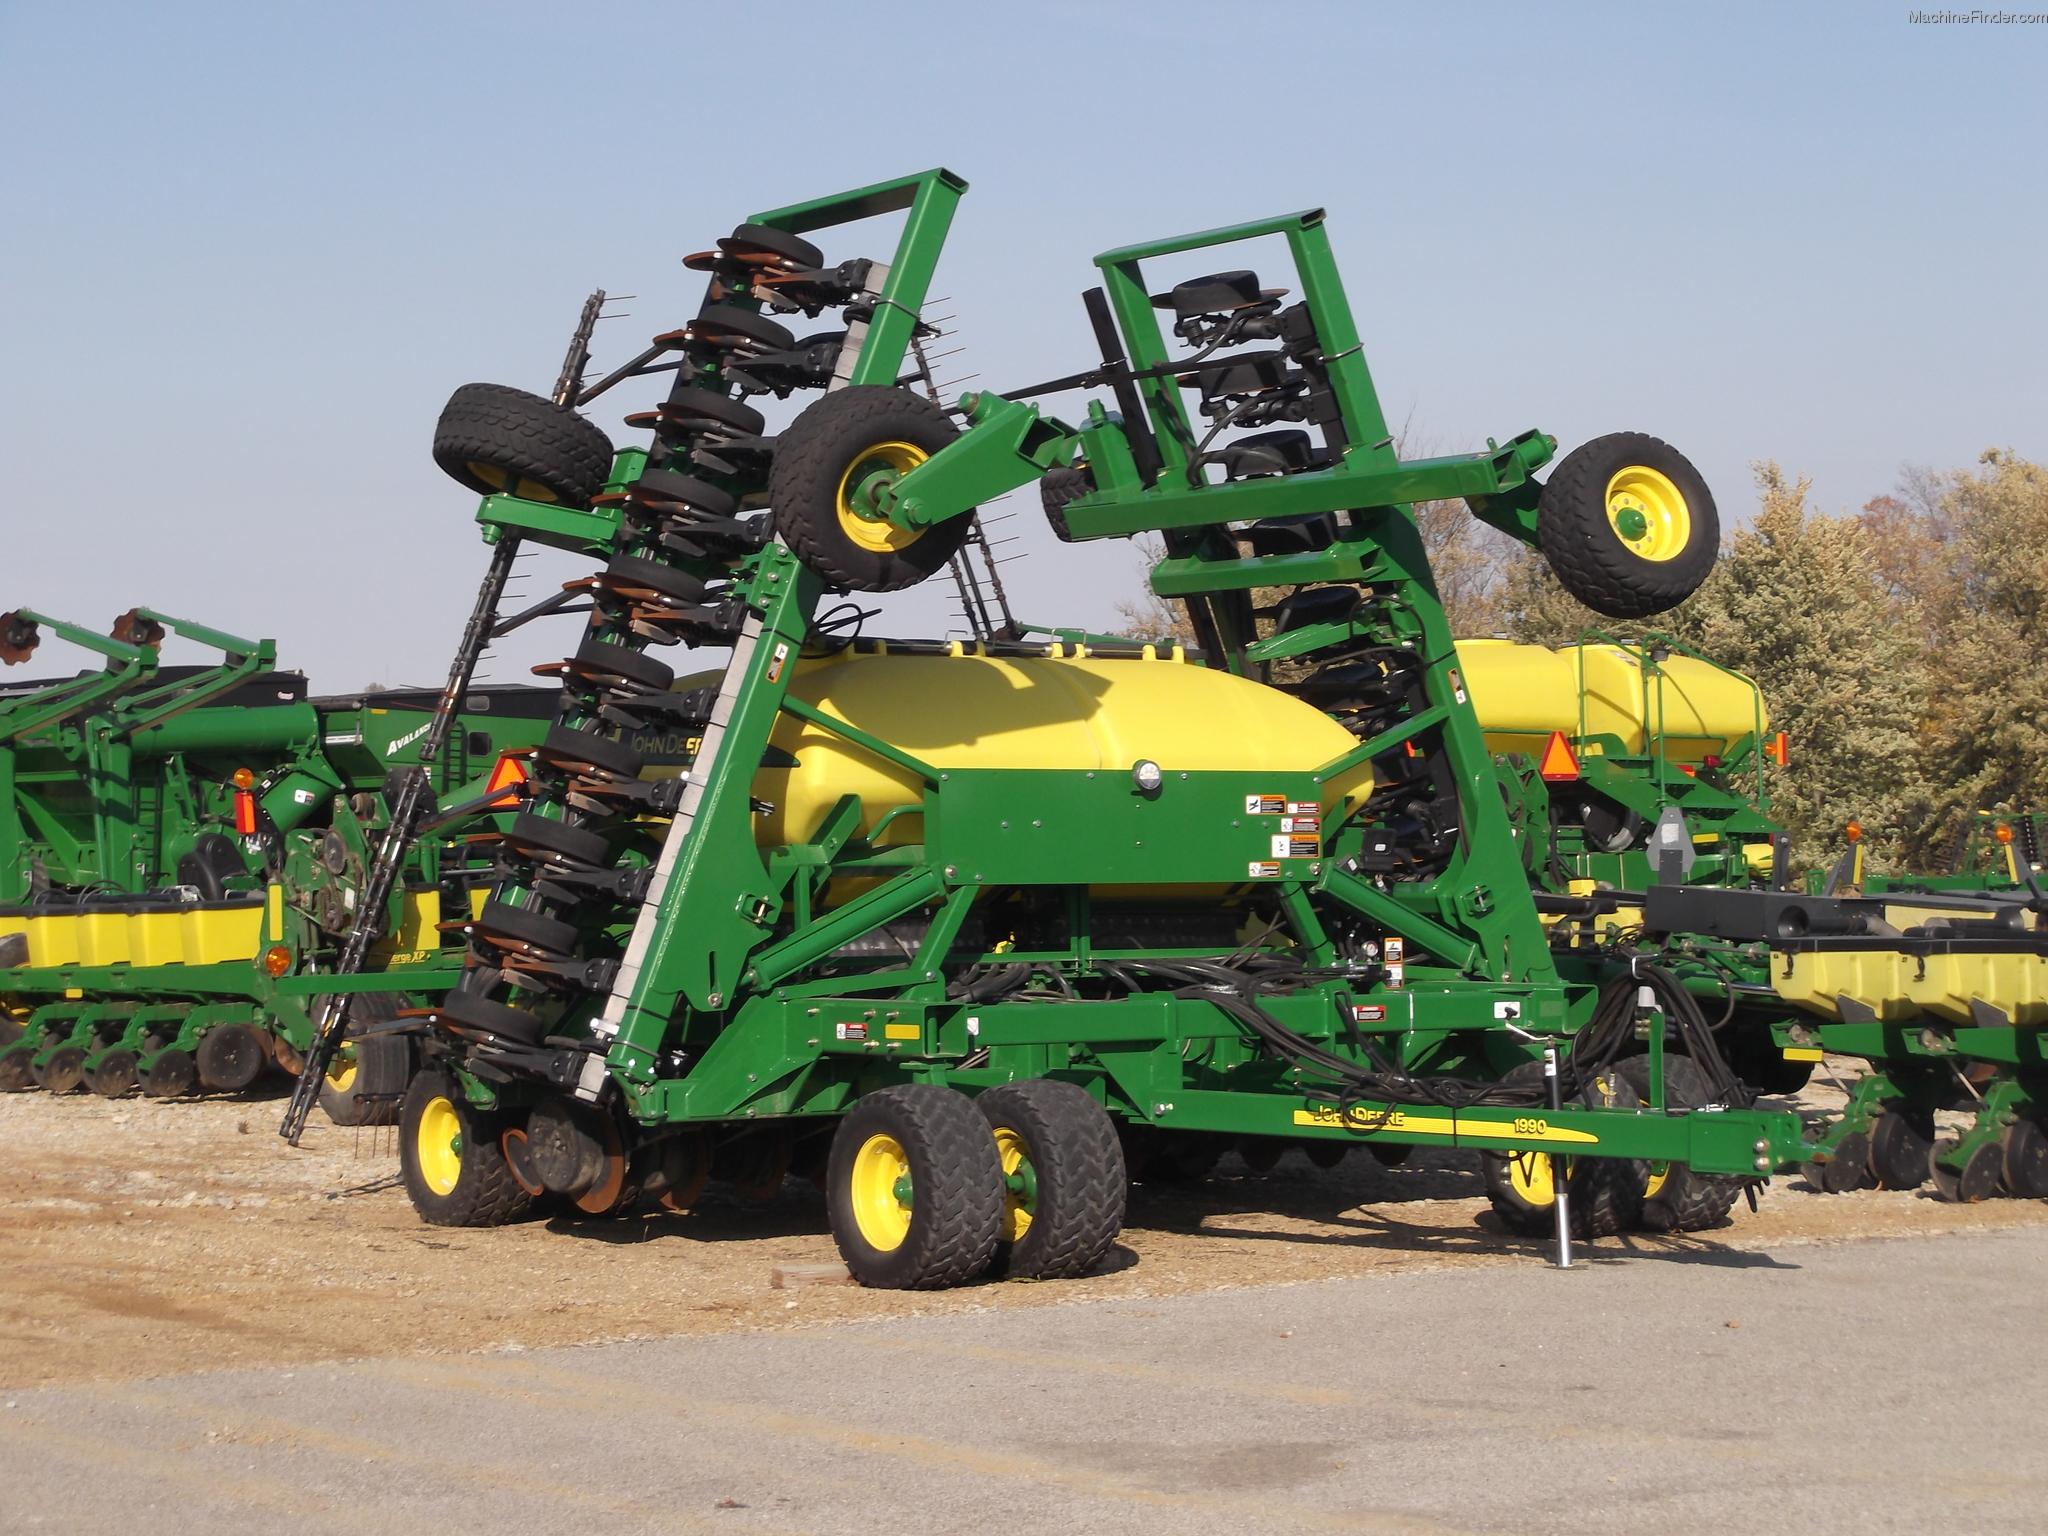 2013 John Deere 1990 CCS 40' Planting & Seeding - Air ...